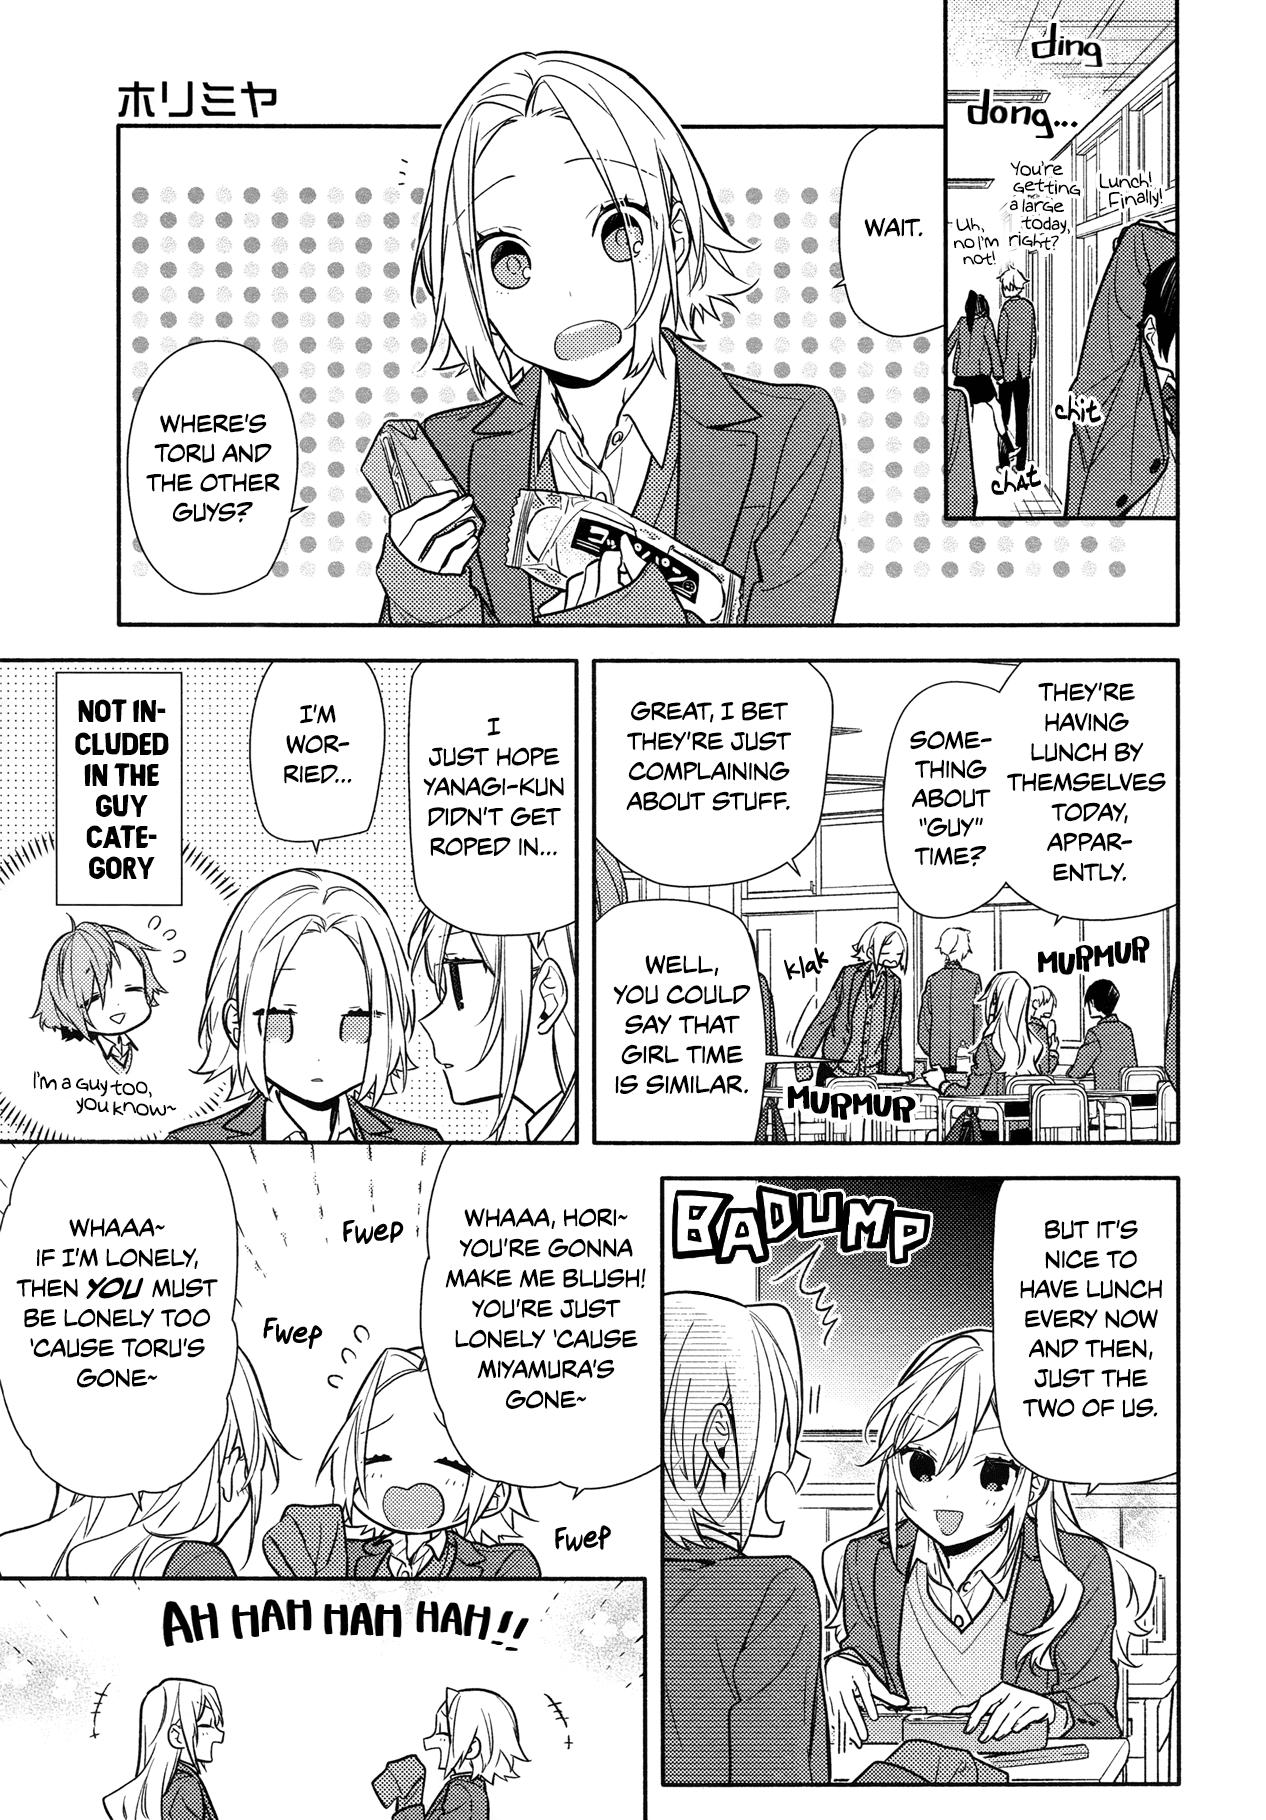 Horimiya, Chapter 111 Page 1